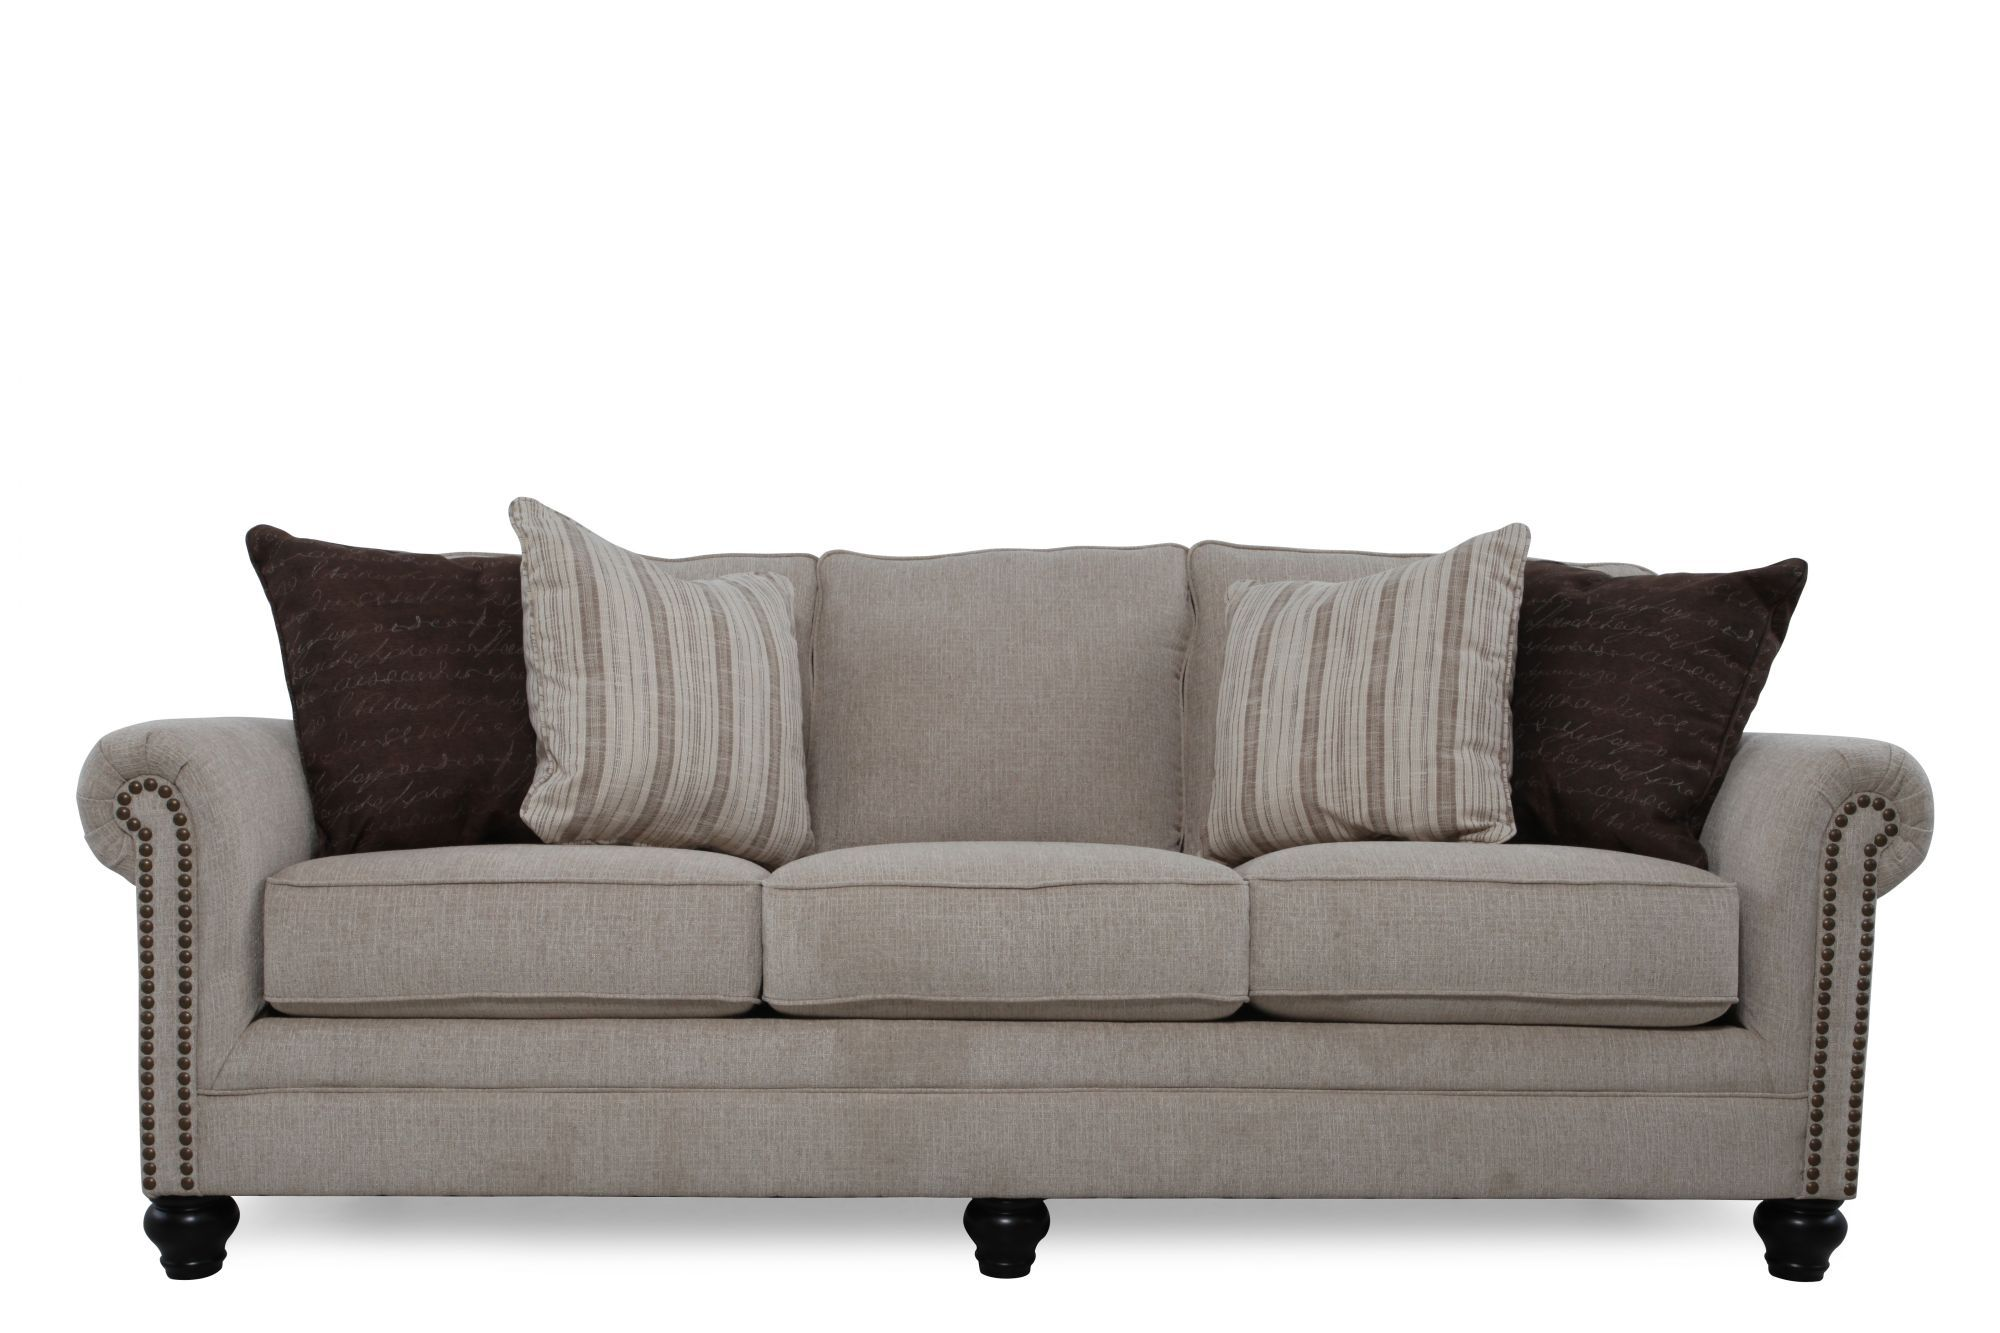 Ashley Milari Linen Sofa Ash 1300038 Www Factorydirect Usa